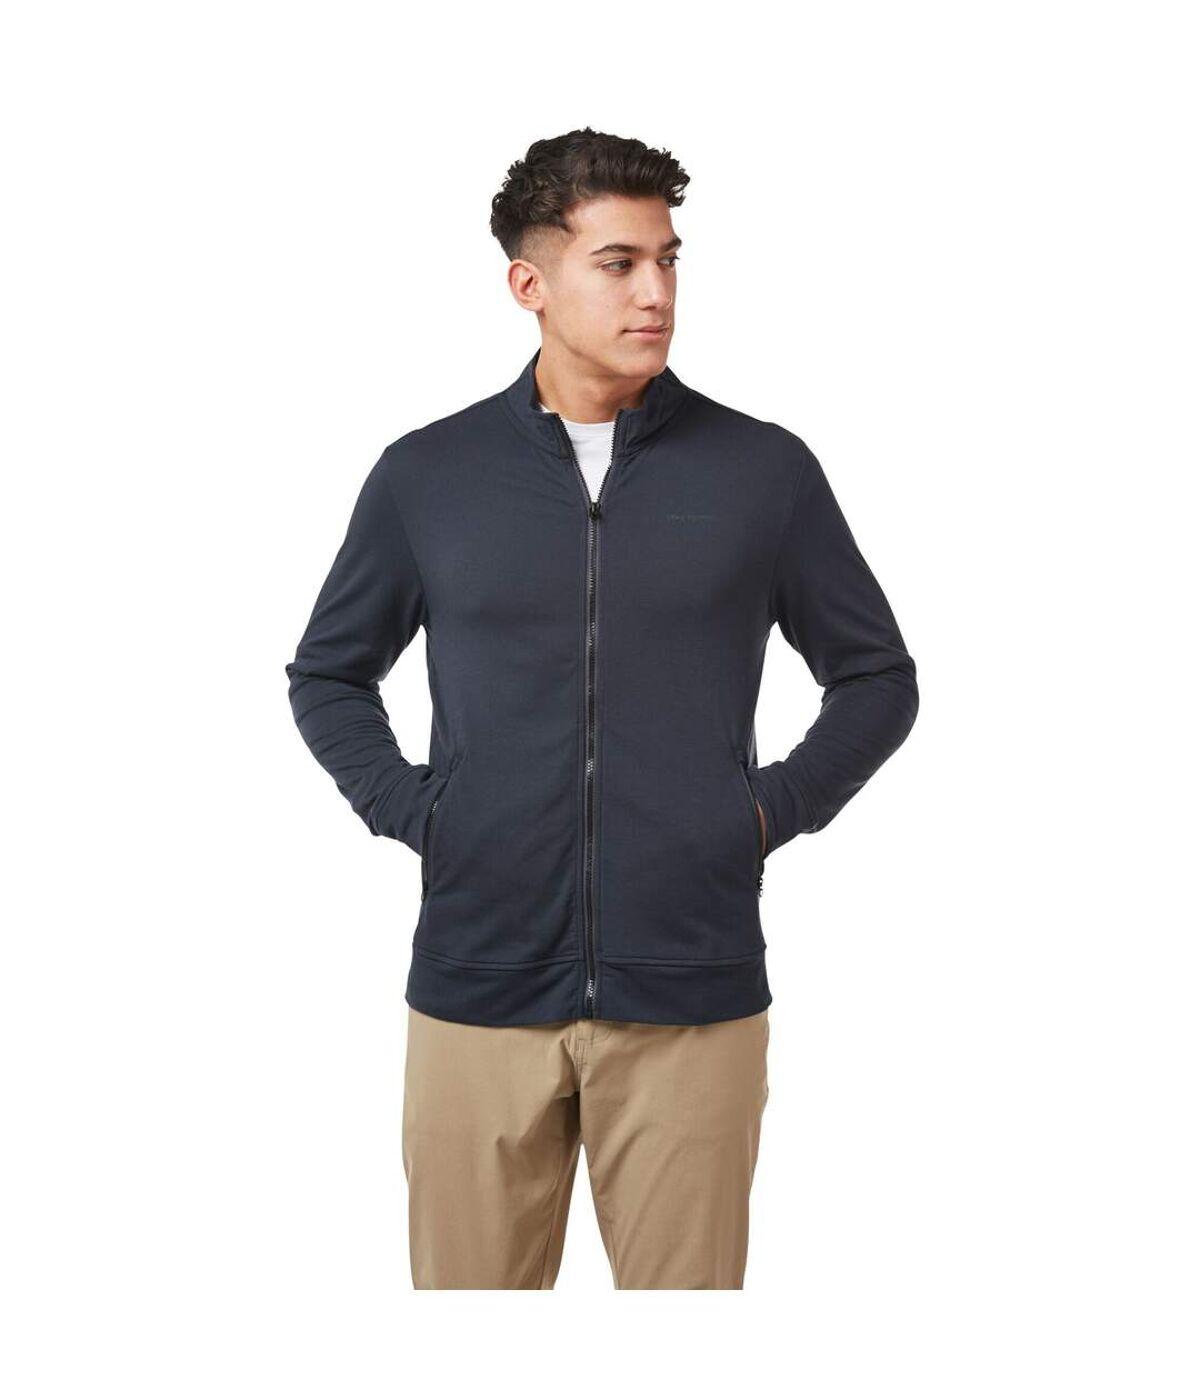 Craghoppers Mens NosiLife Alba Jacket (Steel Blue) - UTCG1102